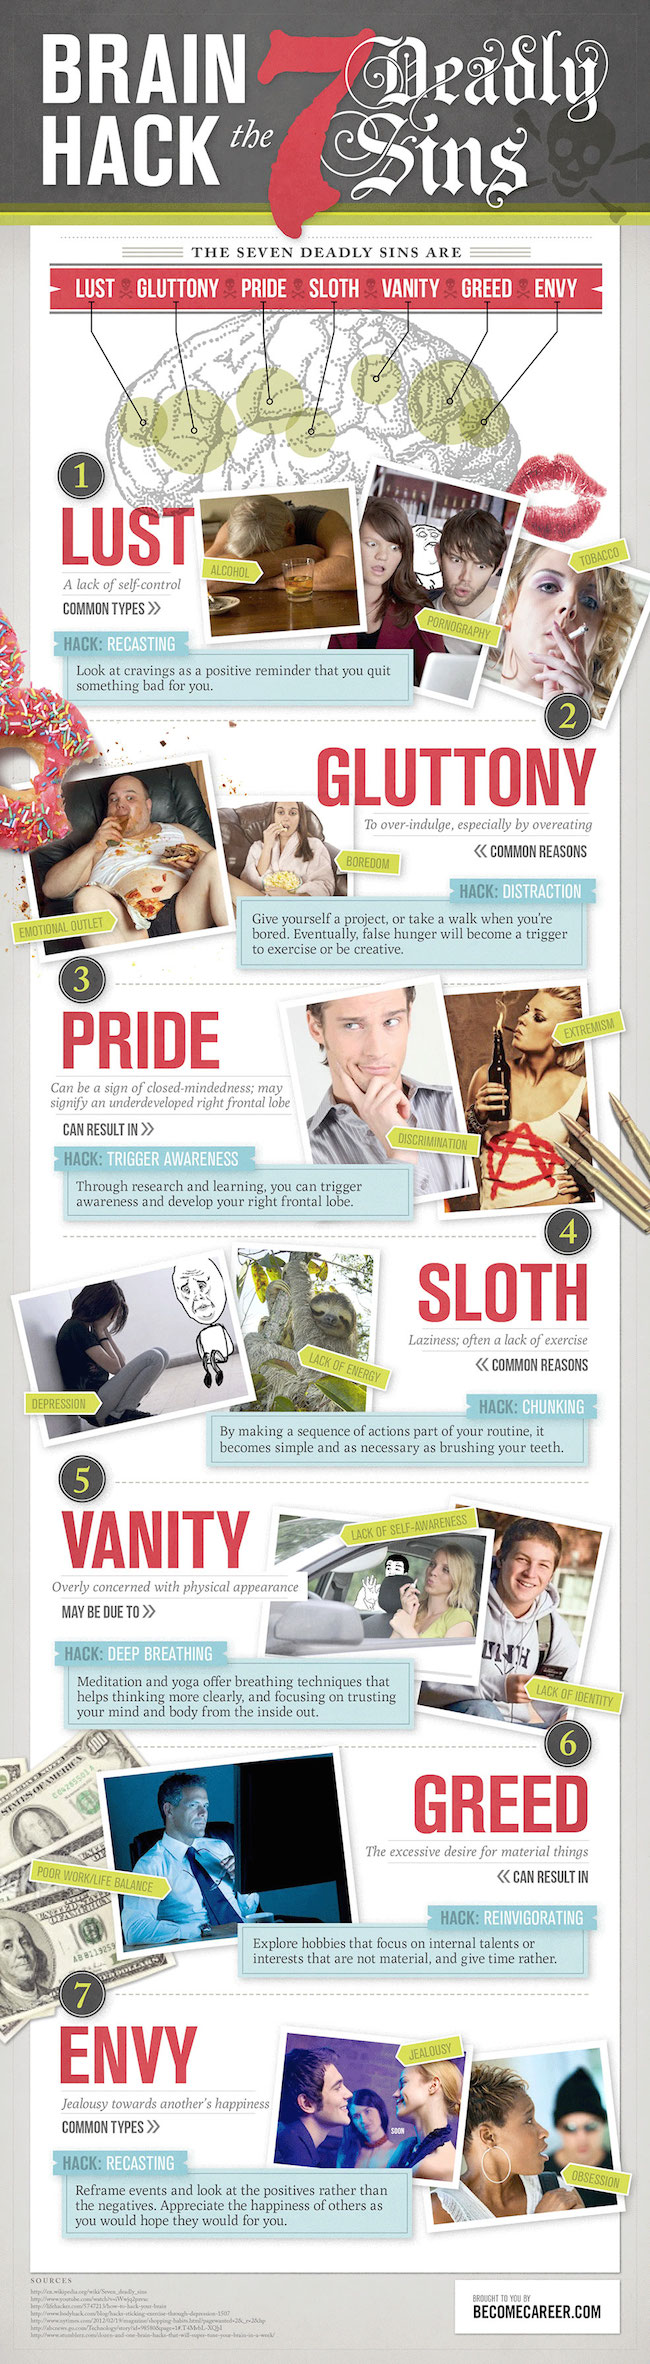 seven-deadly-sins-infograohic